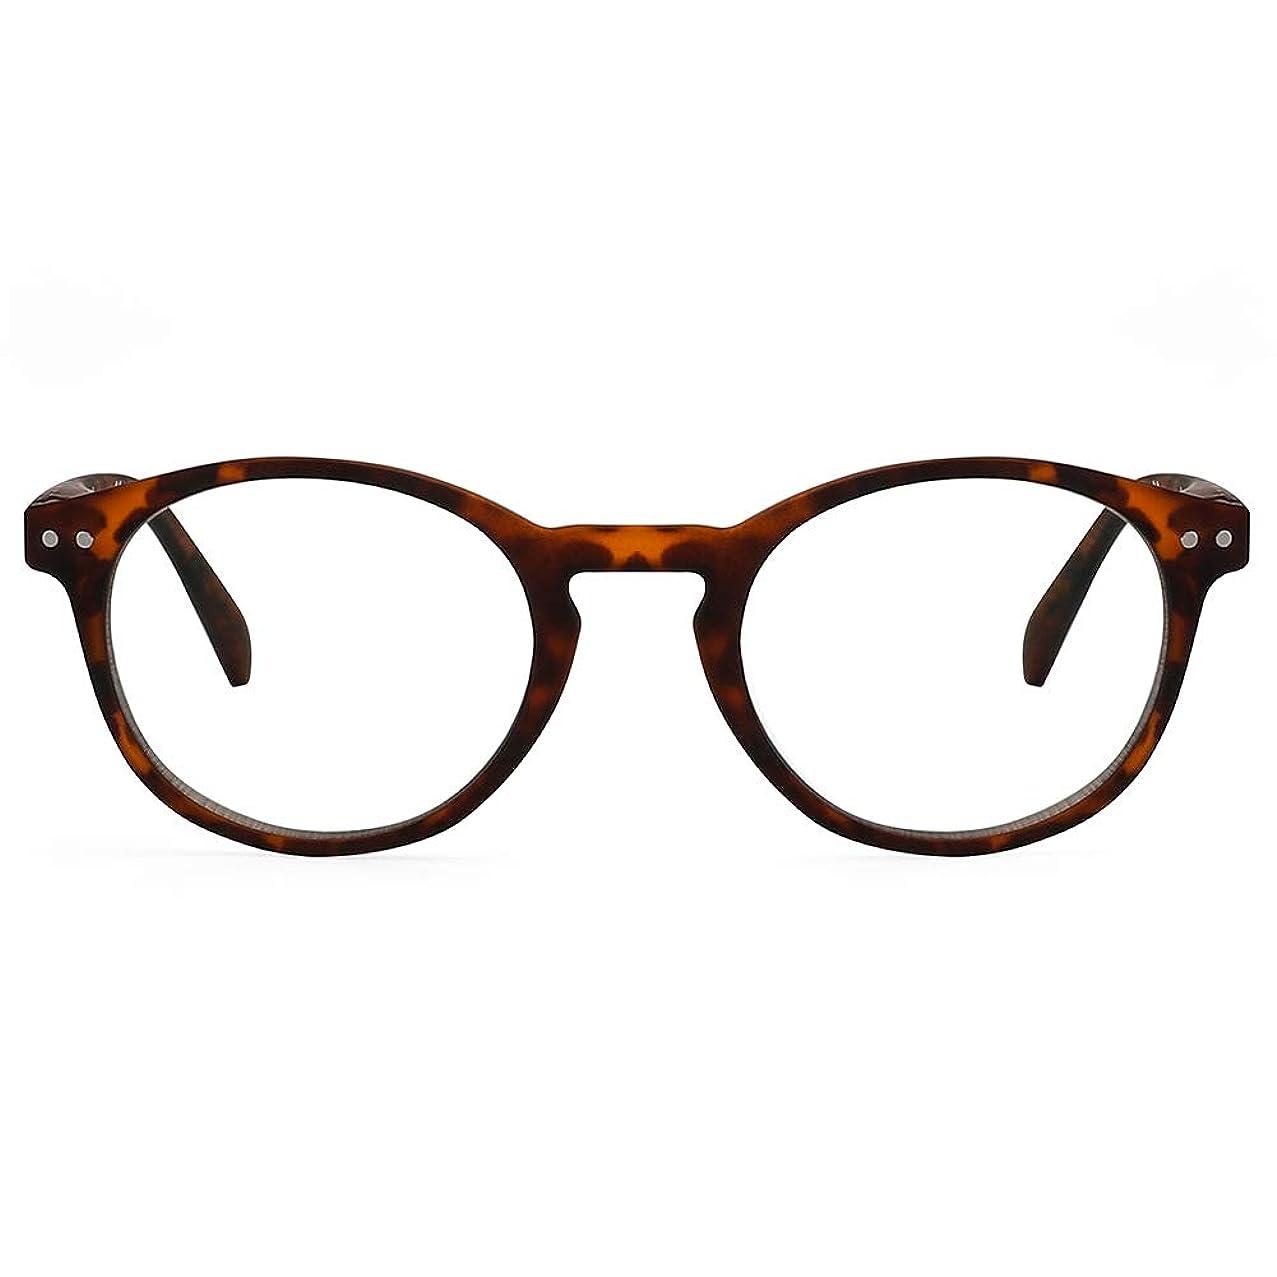 Cyxus Computer Blue Light Blocking Vintage Retro Glasses for Man and Woman, Anti Eye Strain Eyewear UV Headaches for Digital Screens (8301T10,Tortoise)